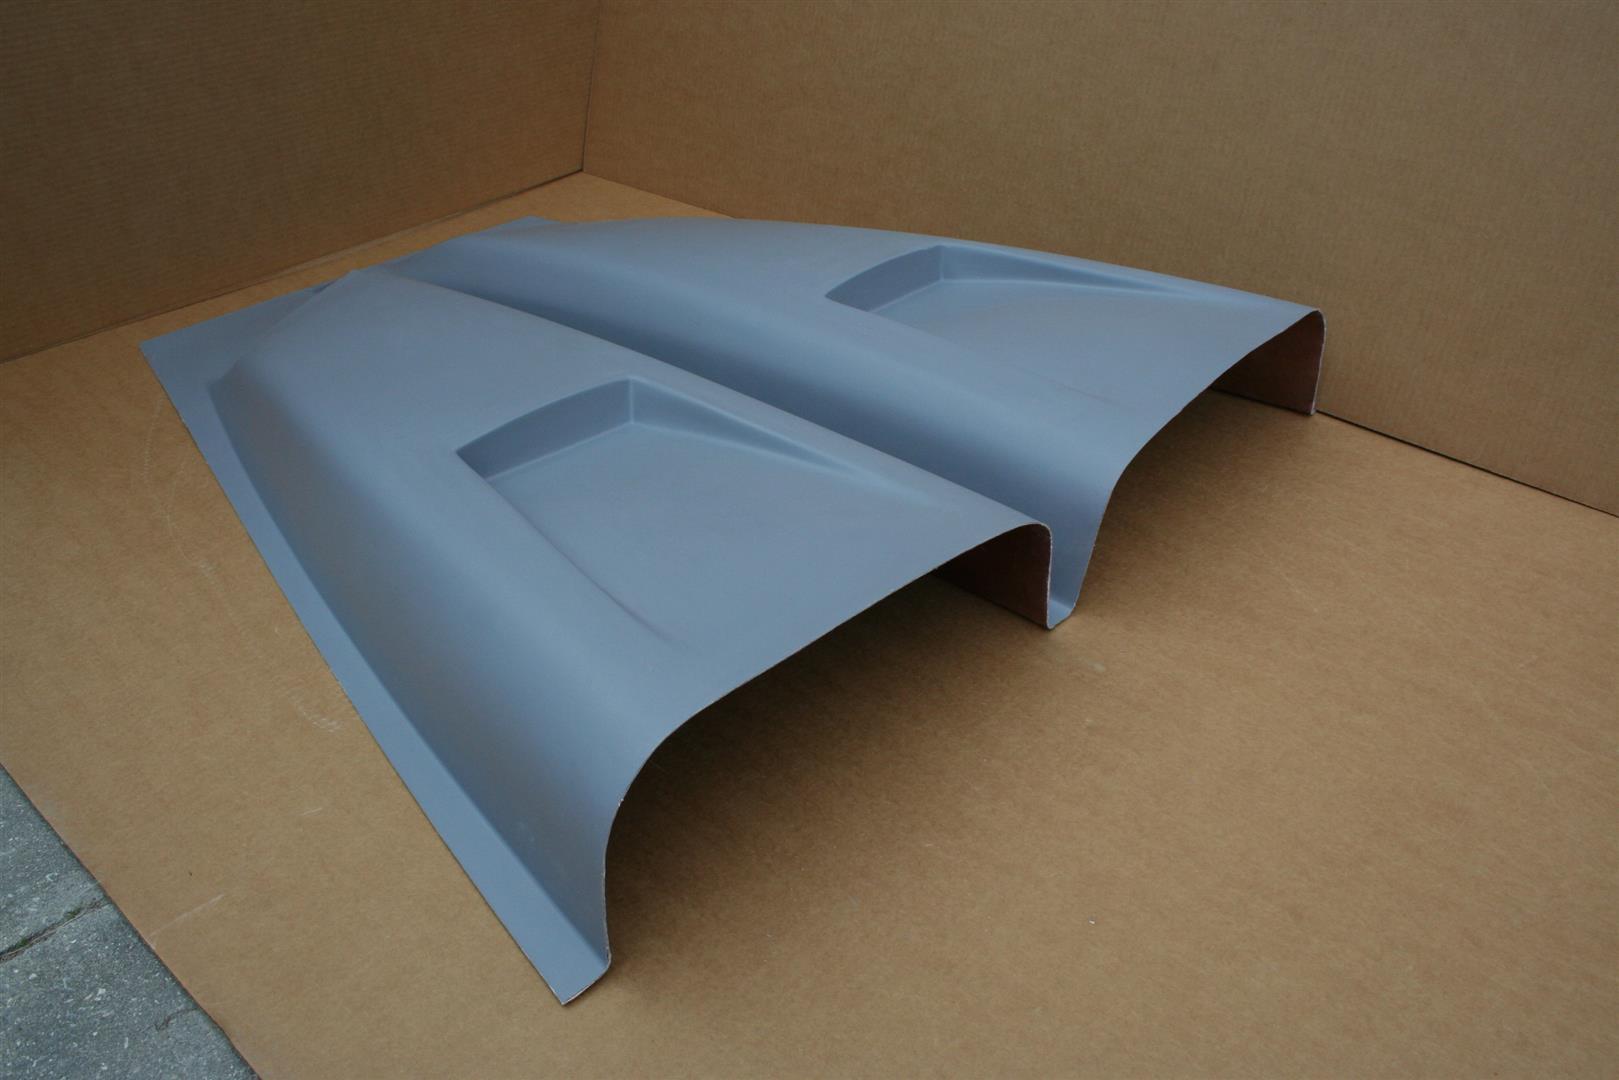 Cowl Induction Hood Air Pan : Ram air cowl induction hood scoop universal dodge chevy ebay